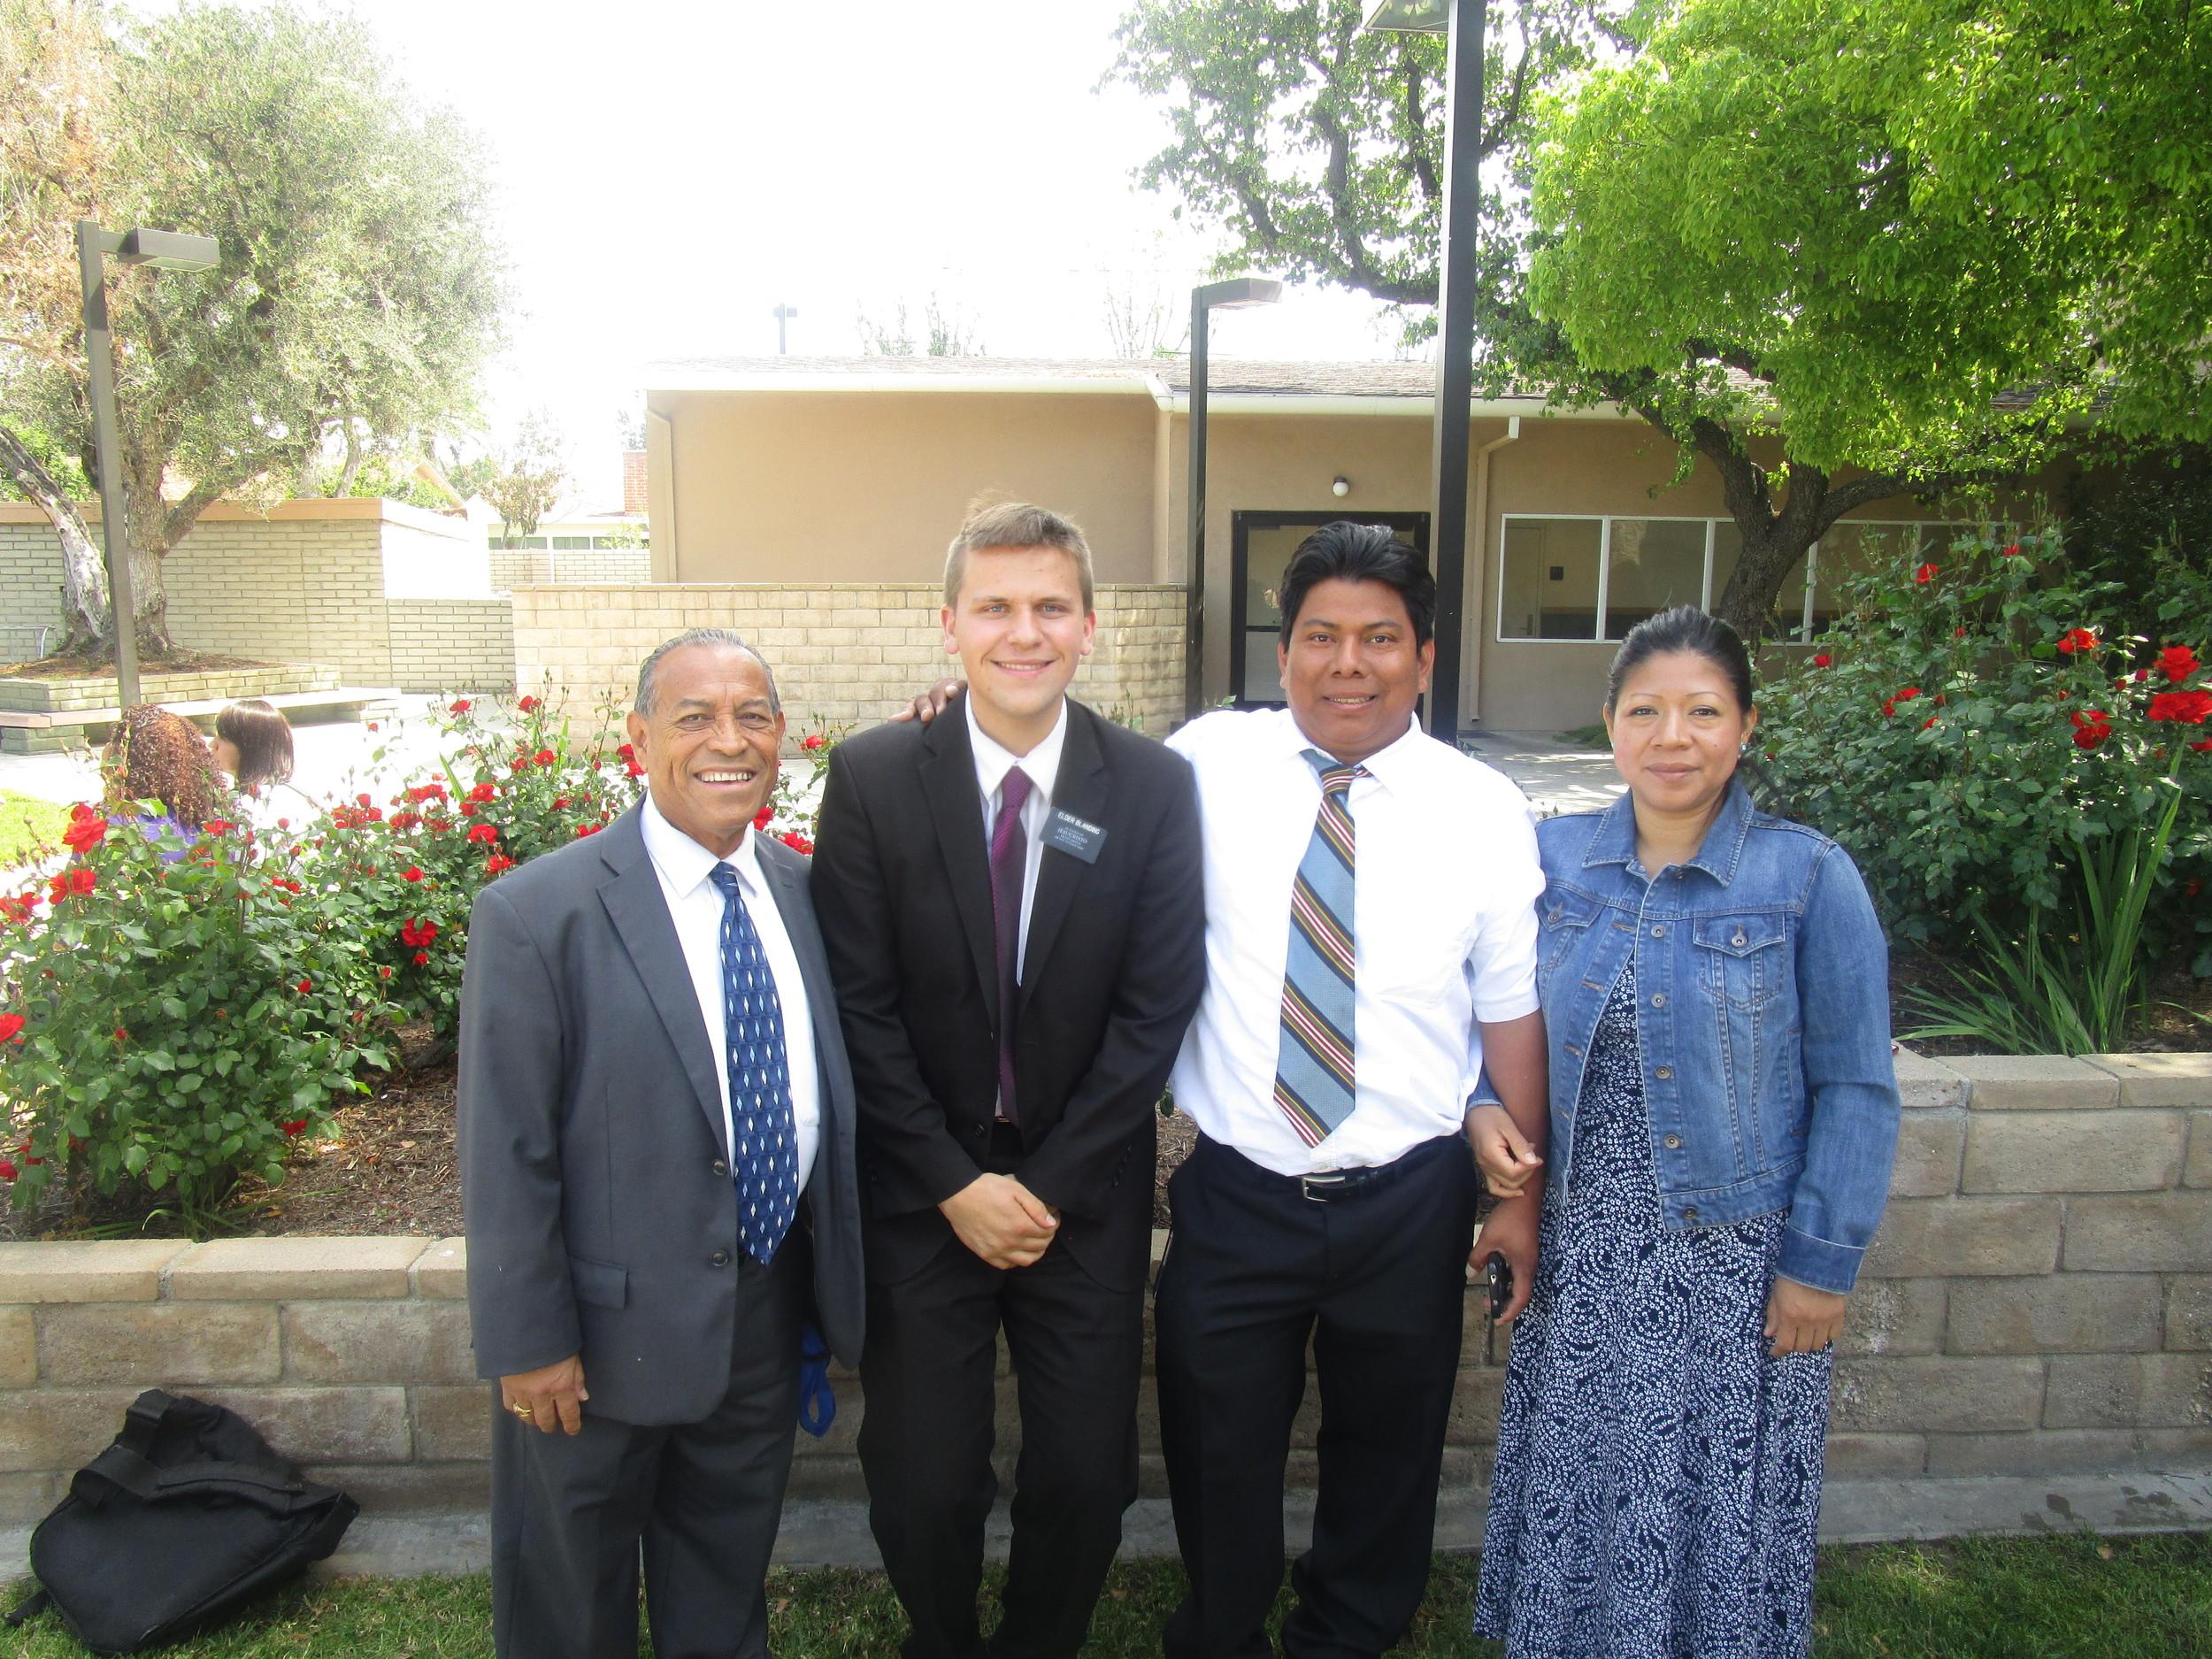 Elder Michael Blanding